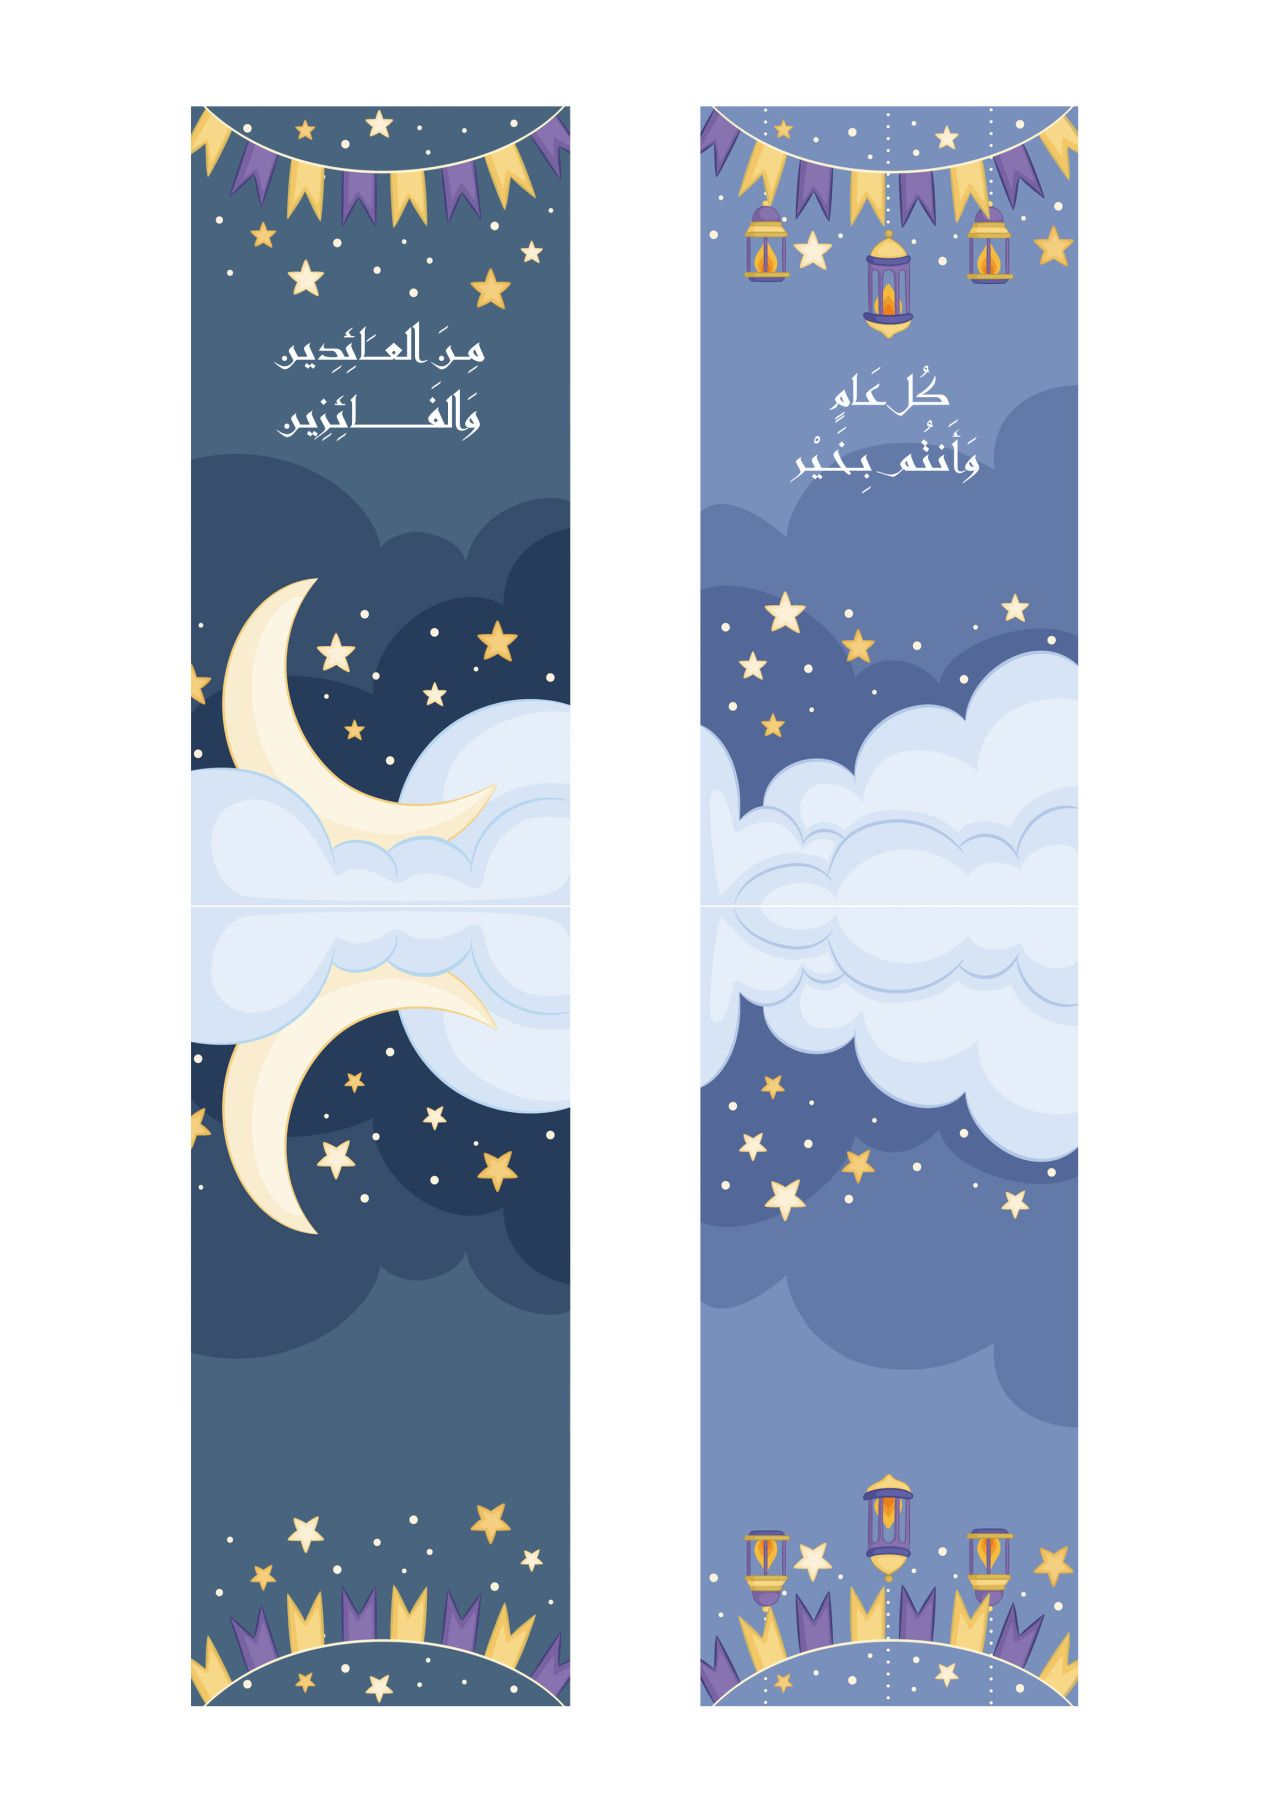 مطبوعات بطاقات عيد الفطر Eid Fitr Greeting Printables 2017 Eid Stickers Eid Decoration Eid Crafts